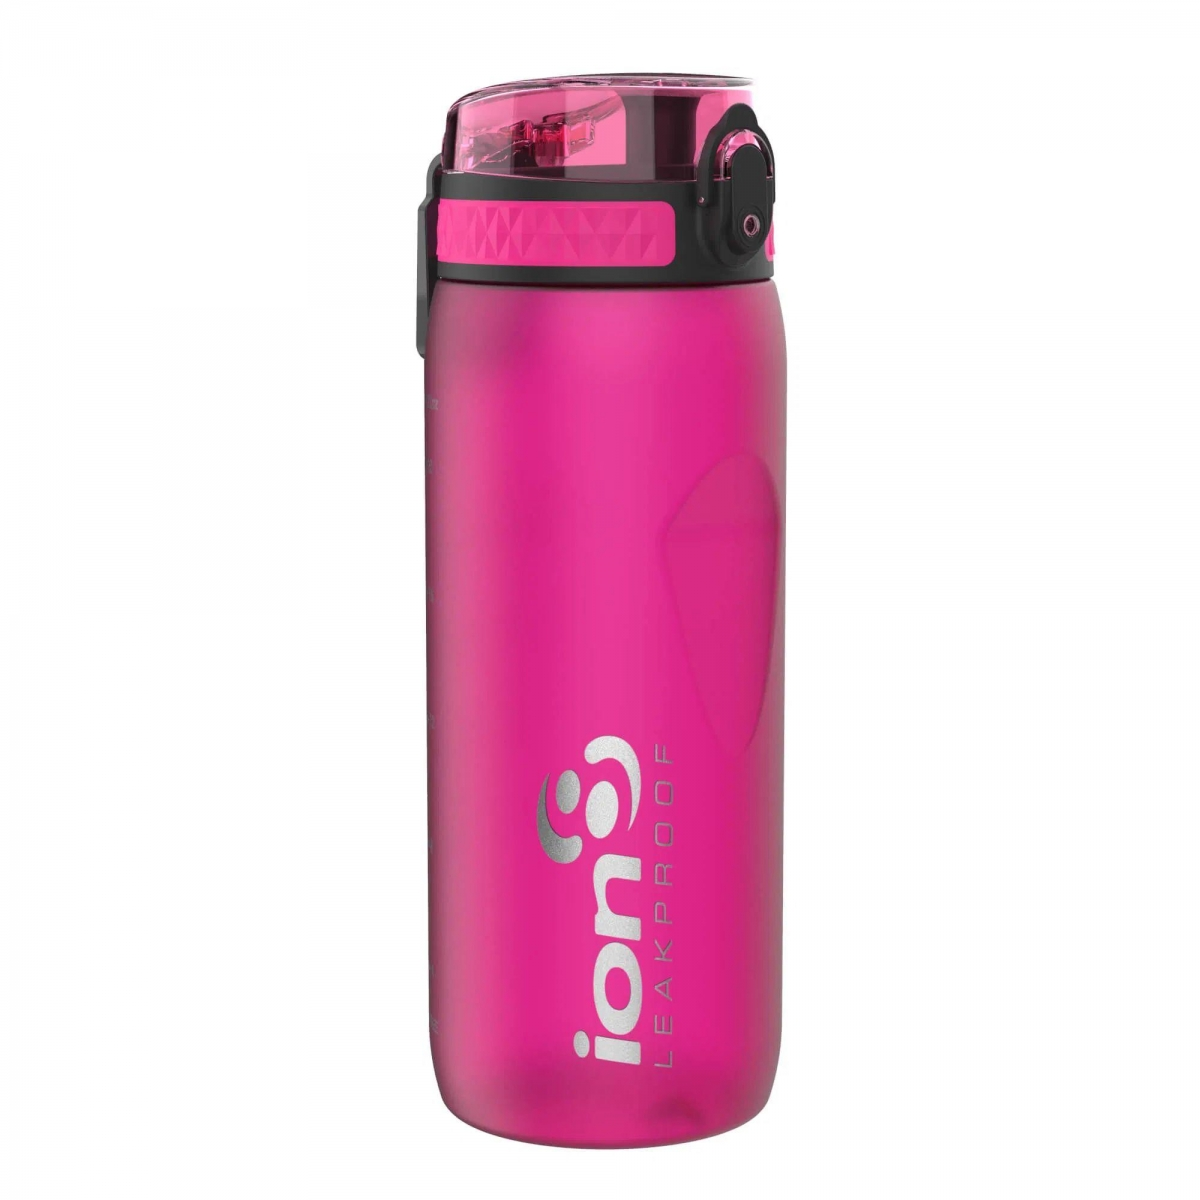 Lahev na vodu Ion8 One Touch Pink, 750 ml - růžová